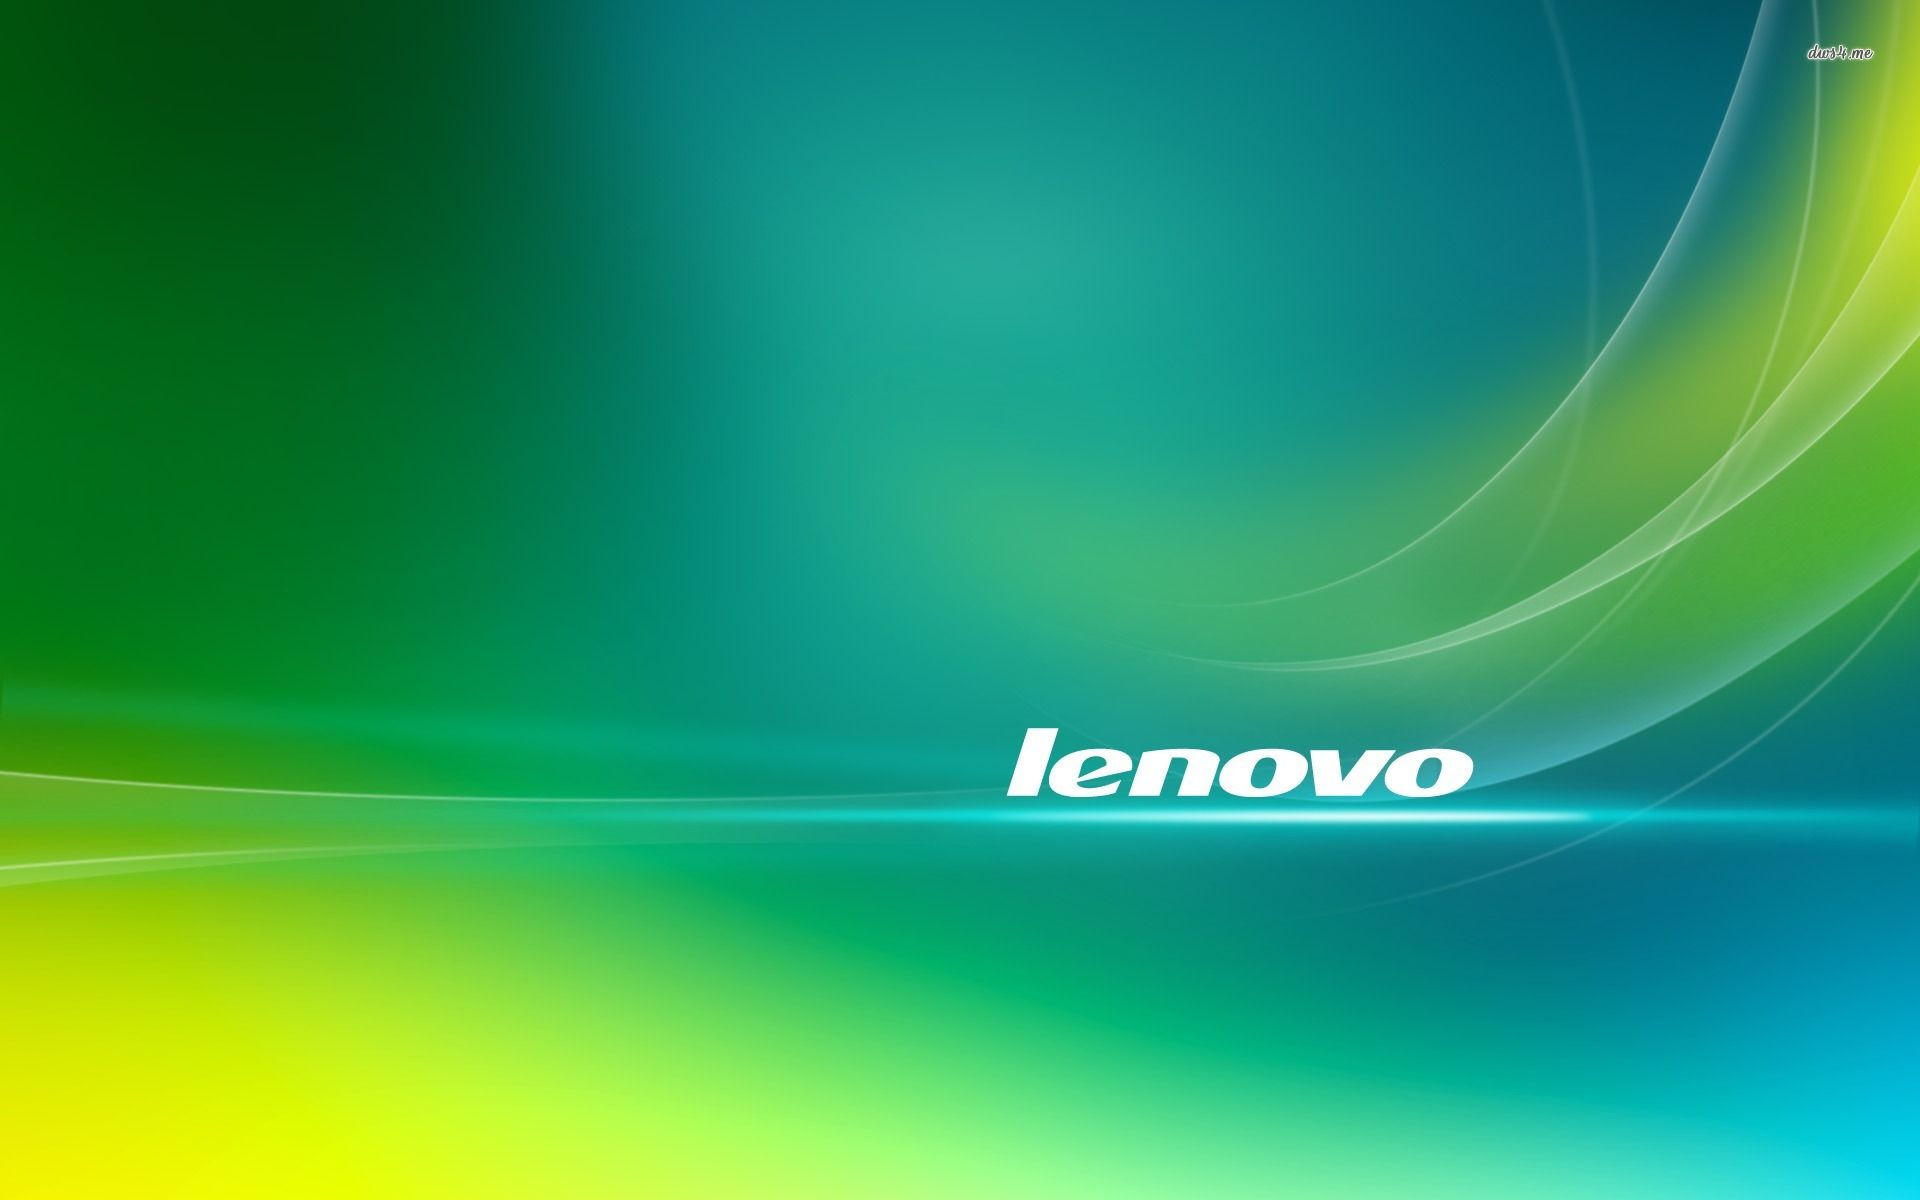 Lenovo Wallpapers - Wallpaper Cave